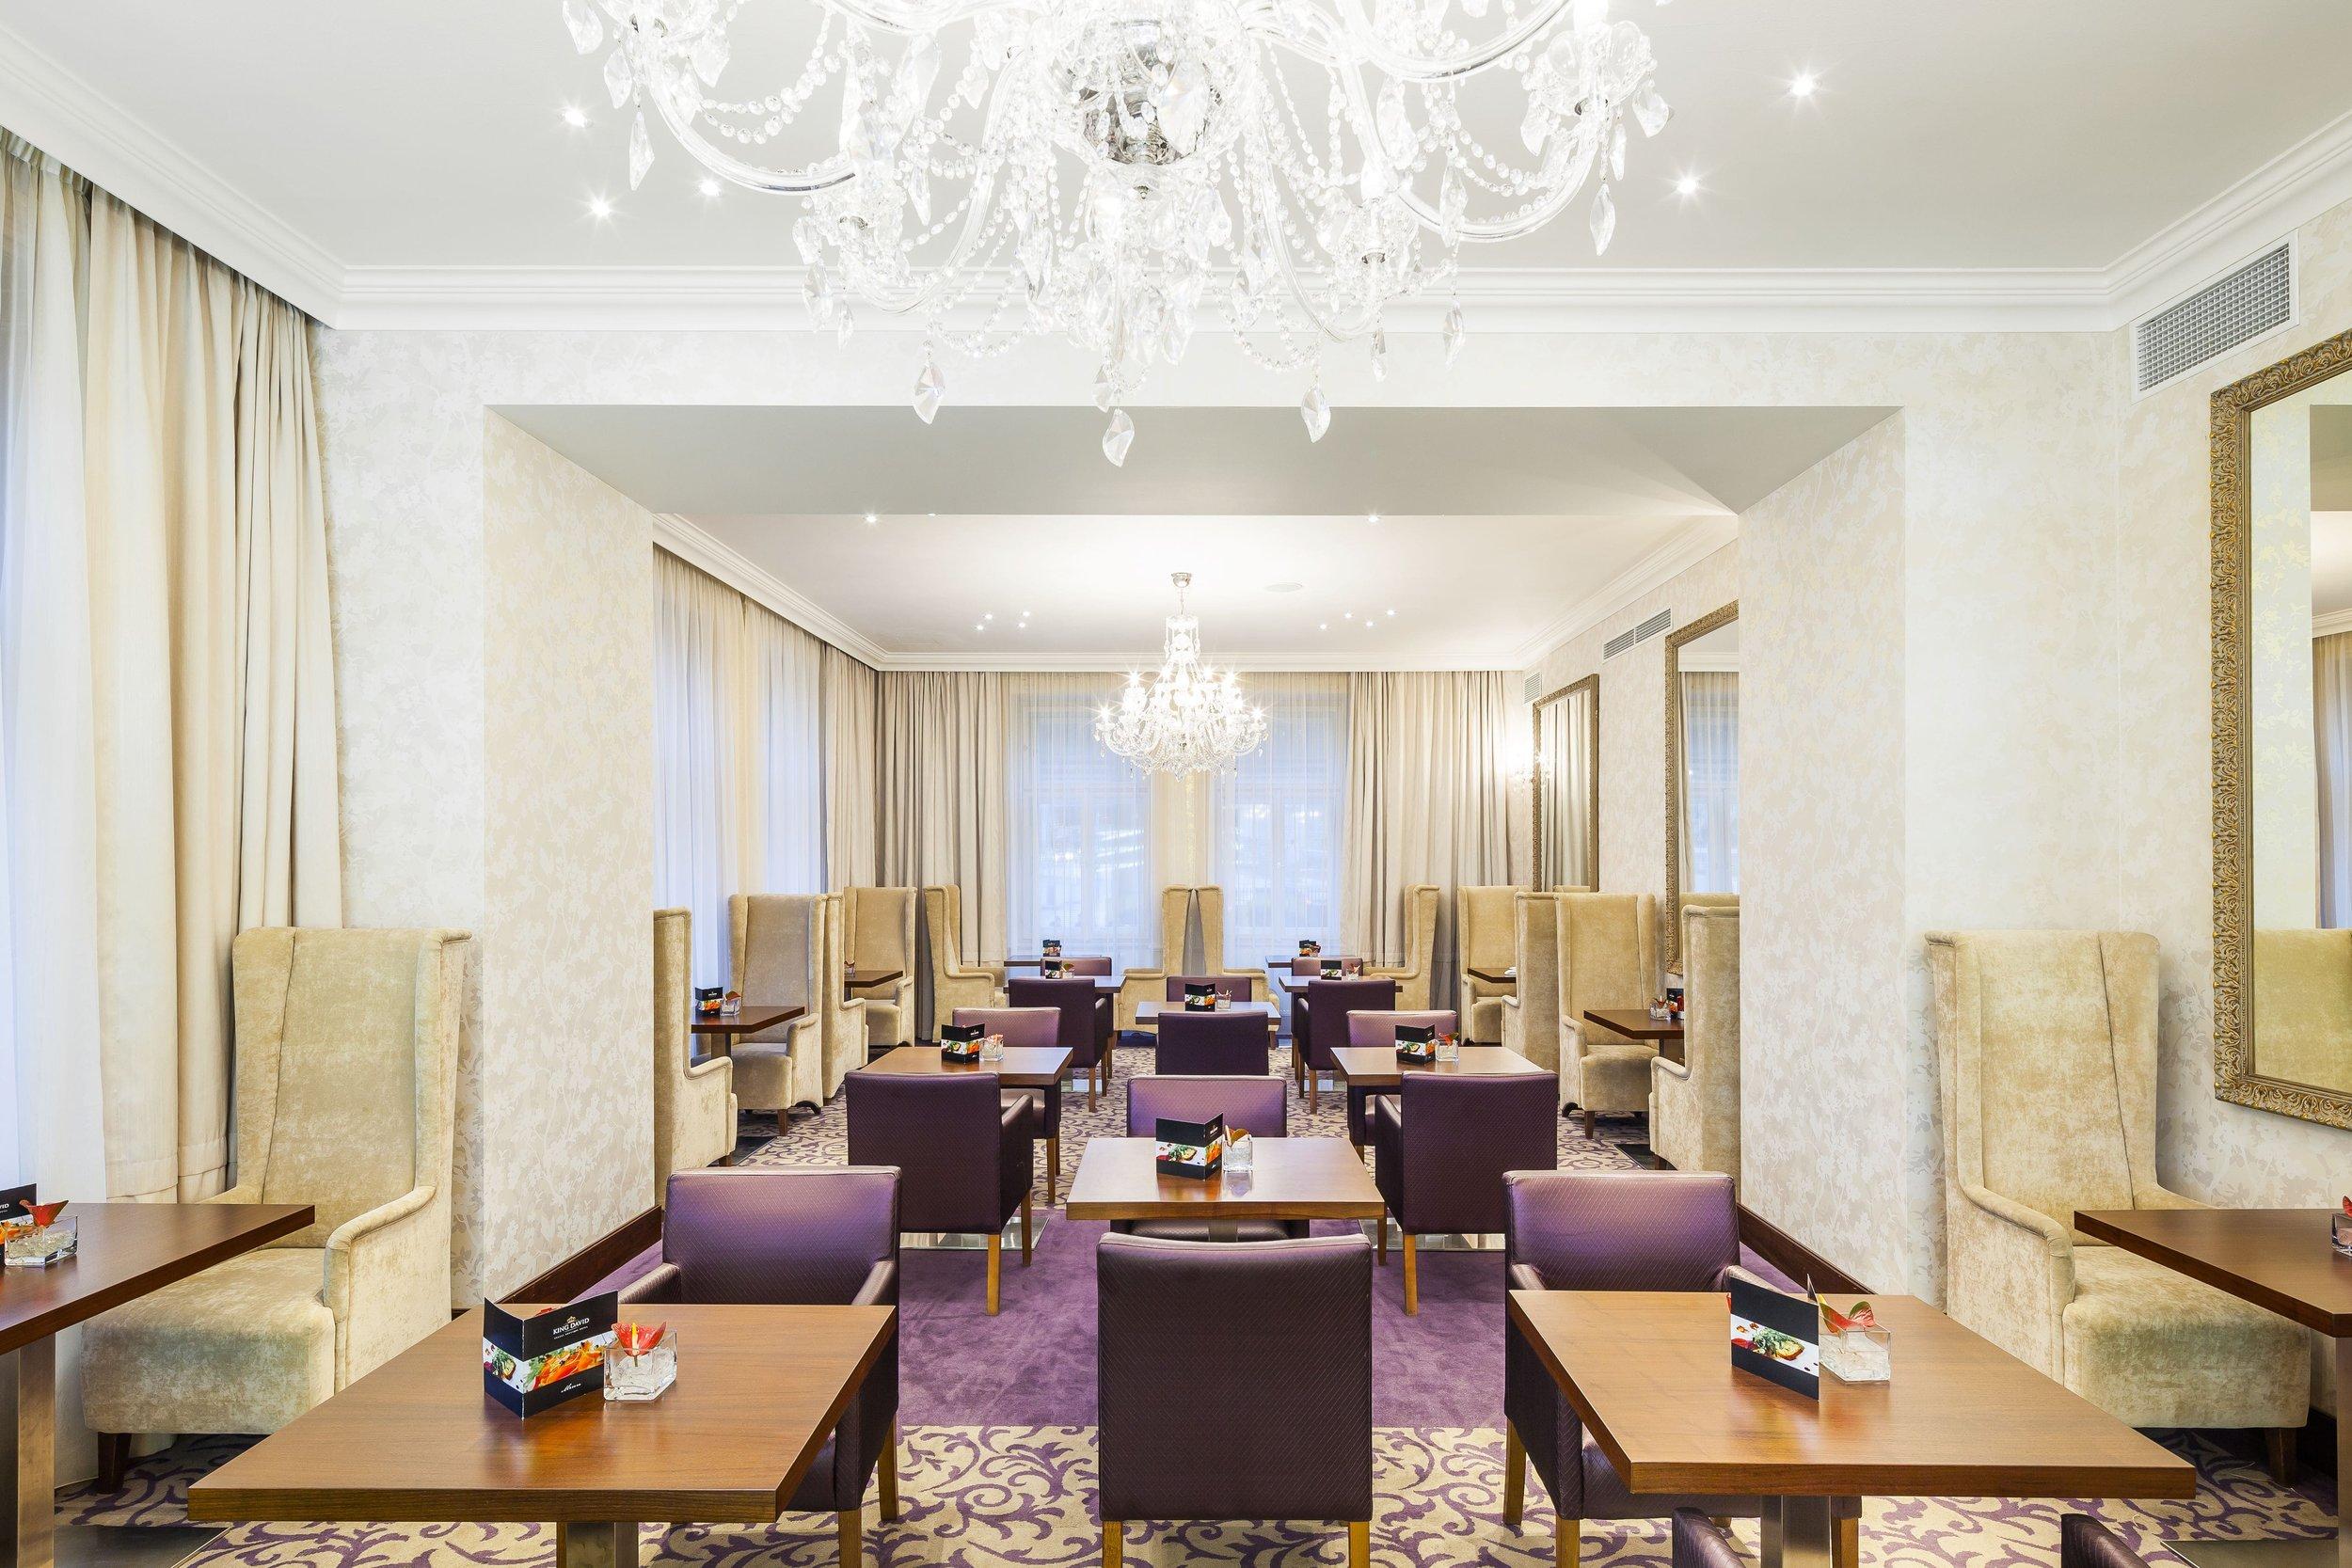 Hotel-King-David-Wranovsky-Crystal-Chandelier-3.jpg